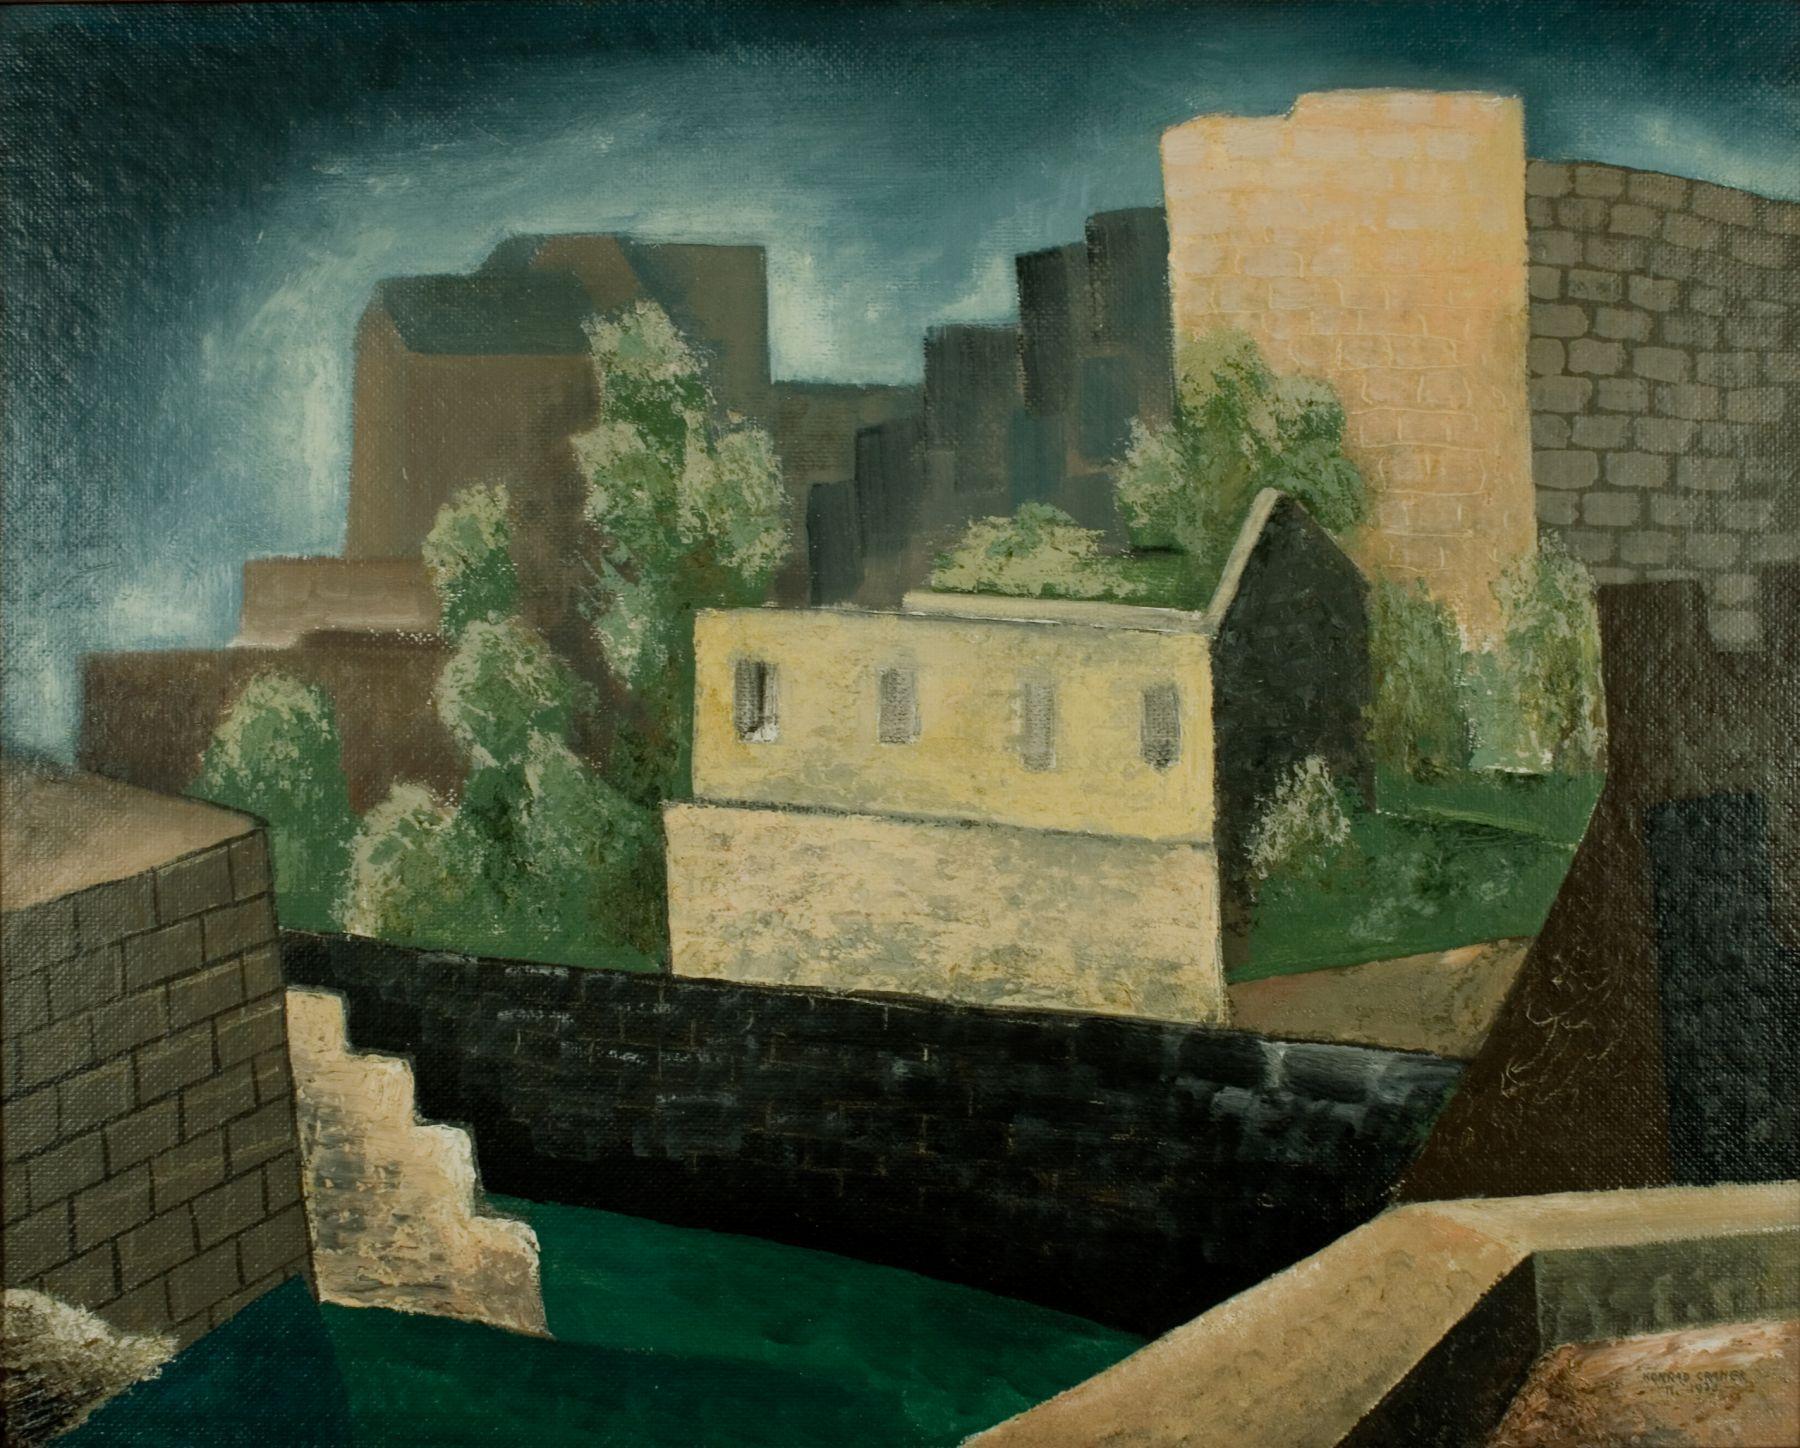 Konrad Cramer, Deserted Lime Kilns, 1930, oil on canvasboard, 24 x 30 inches